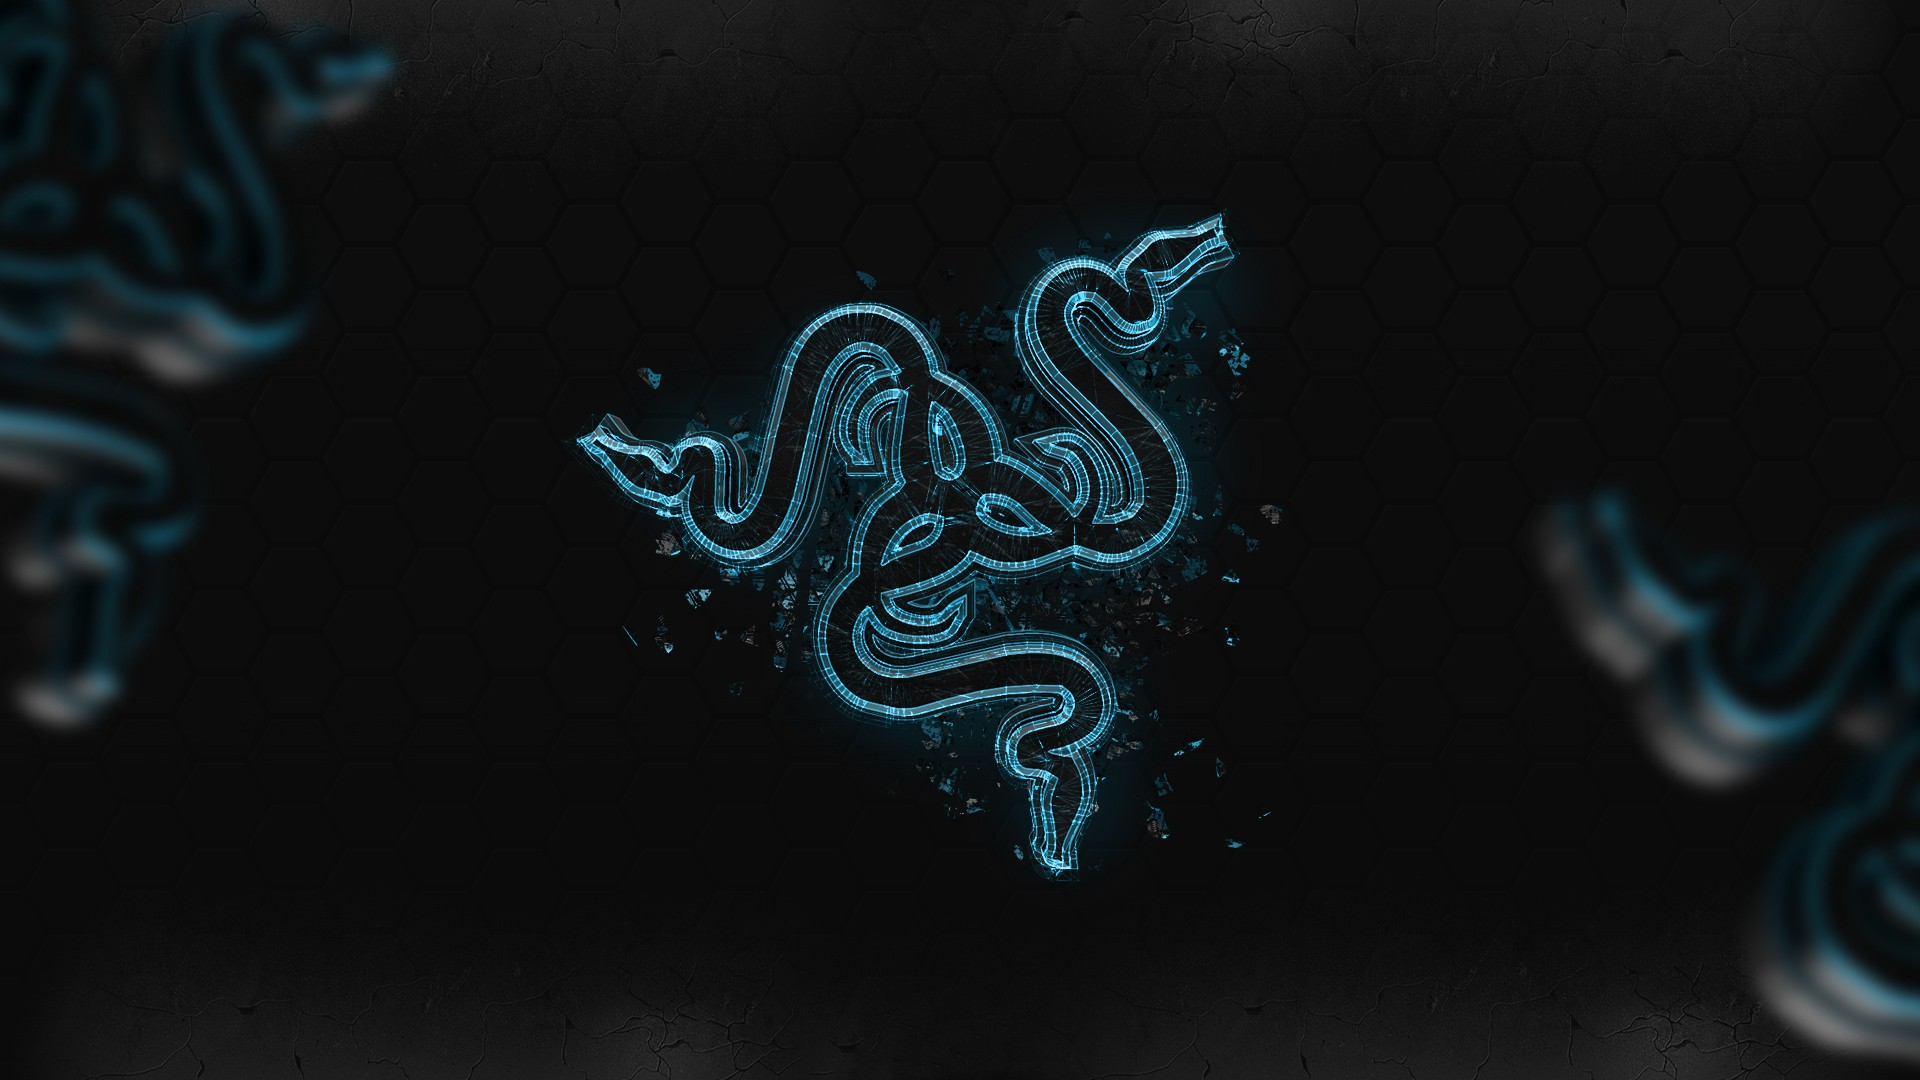 Amazing Razer Blue Graffiti Pictures & Backgrounds